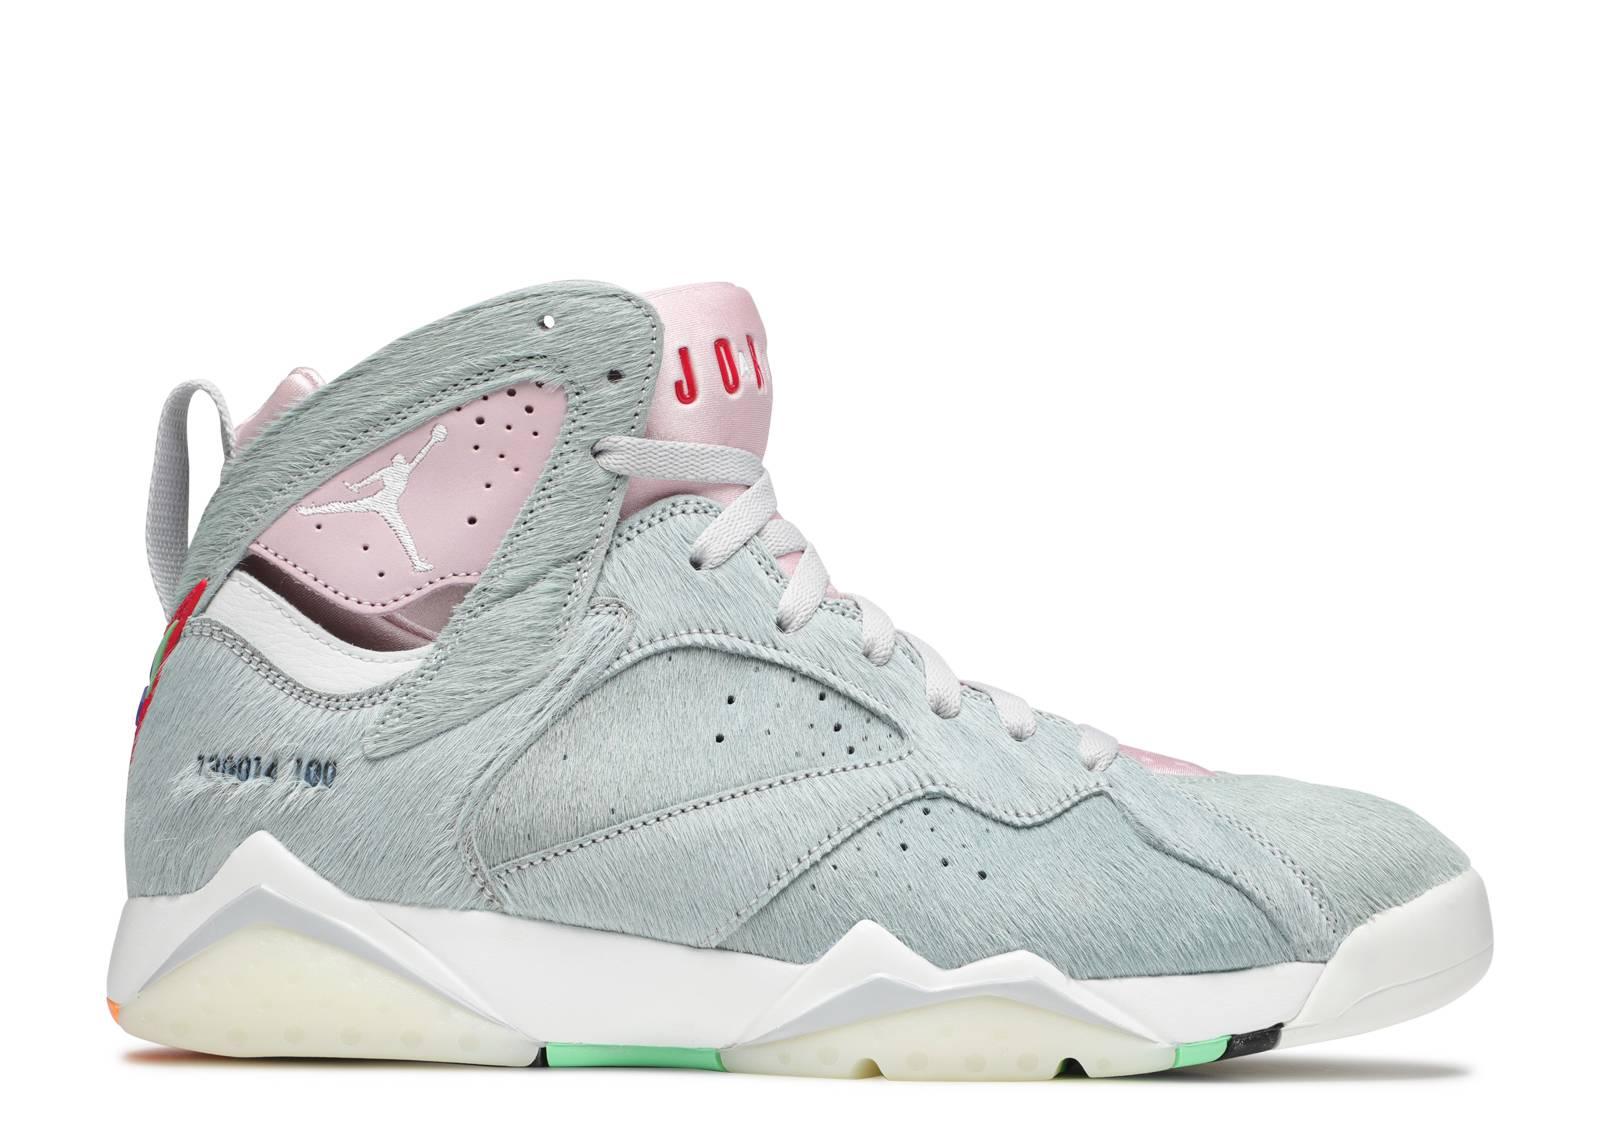 Nylon binario vacío  Air Jordan 7 Retro SE 'Hare 2.0' - Air Jordan - CT8528 002 - neutral  grey/summit white/pink foam/summit white | Flight Club